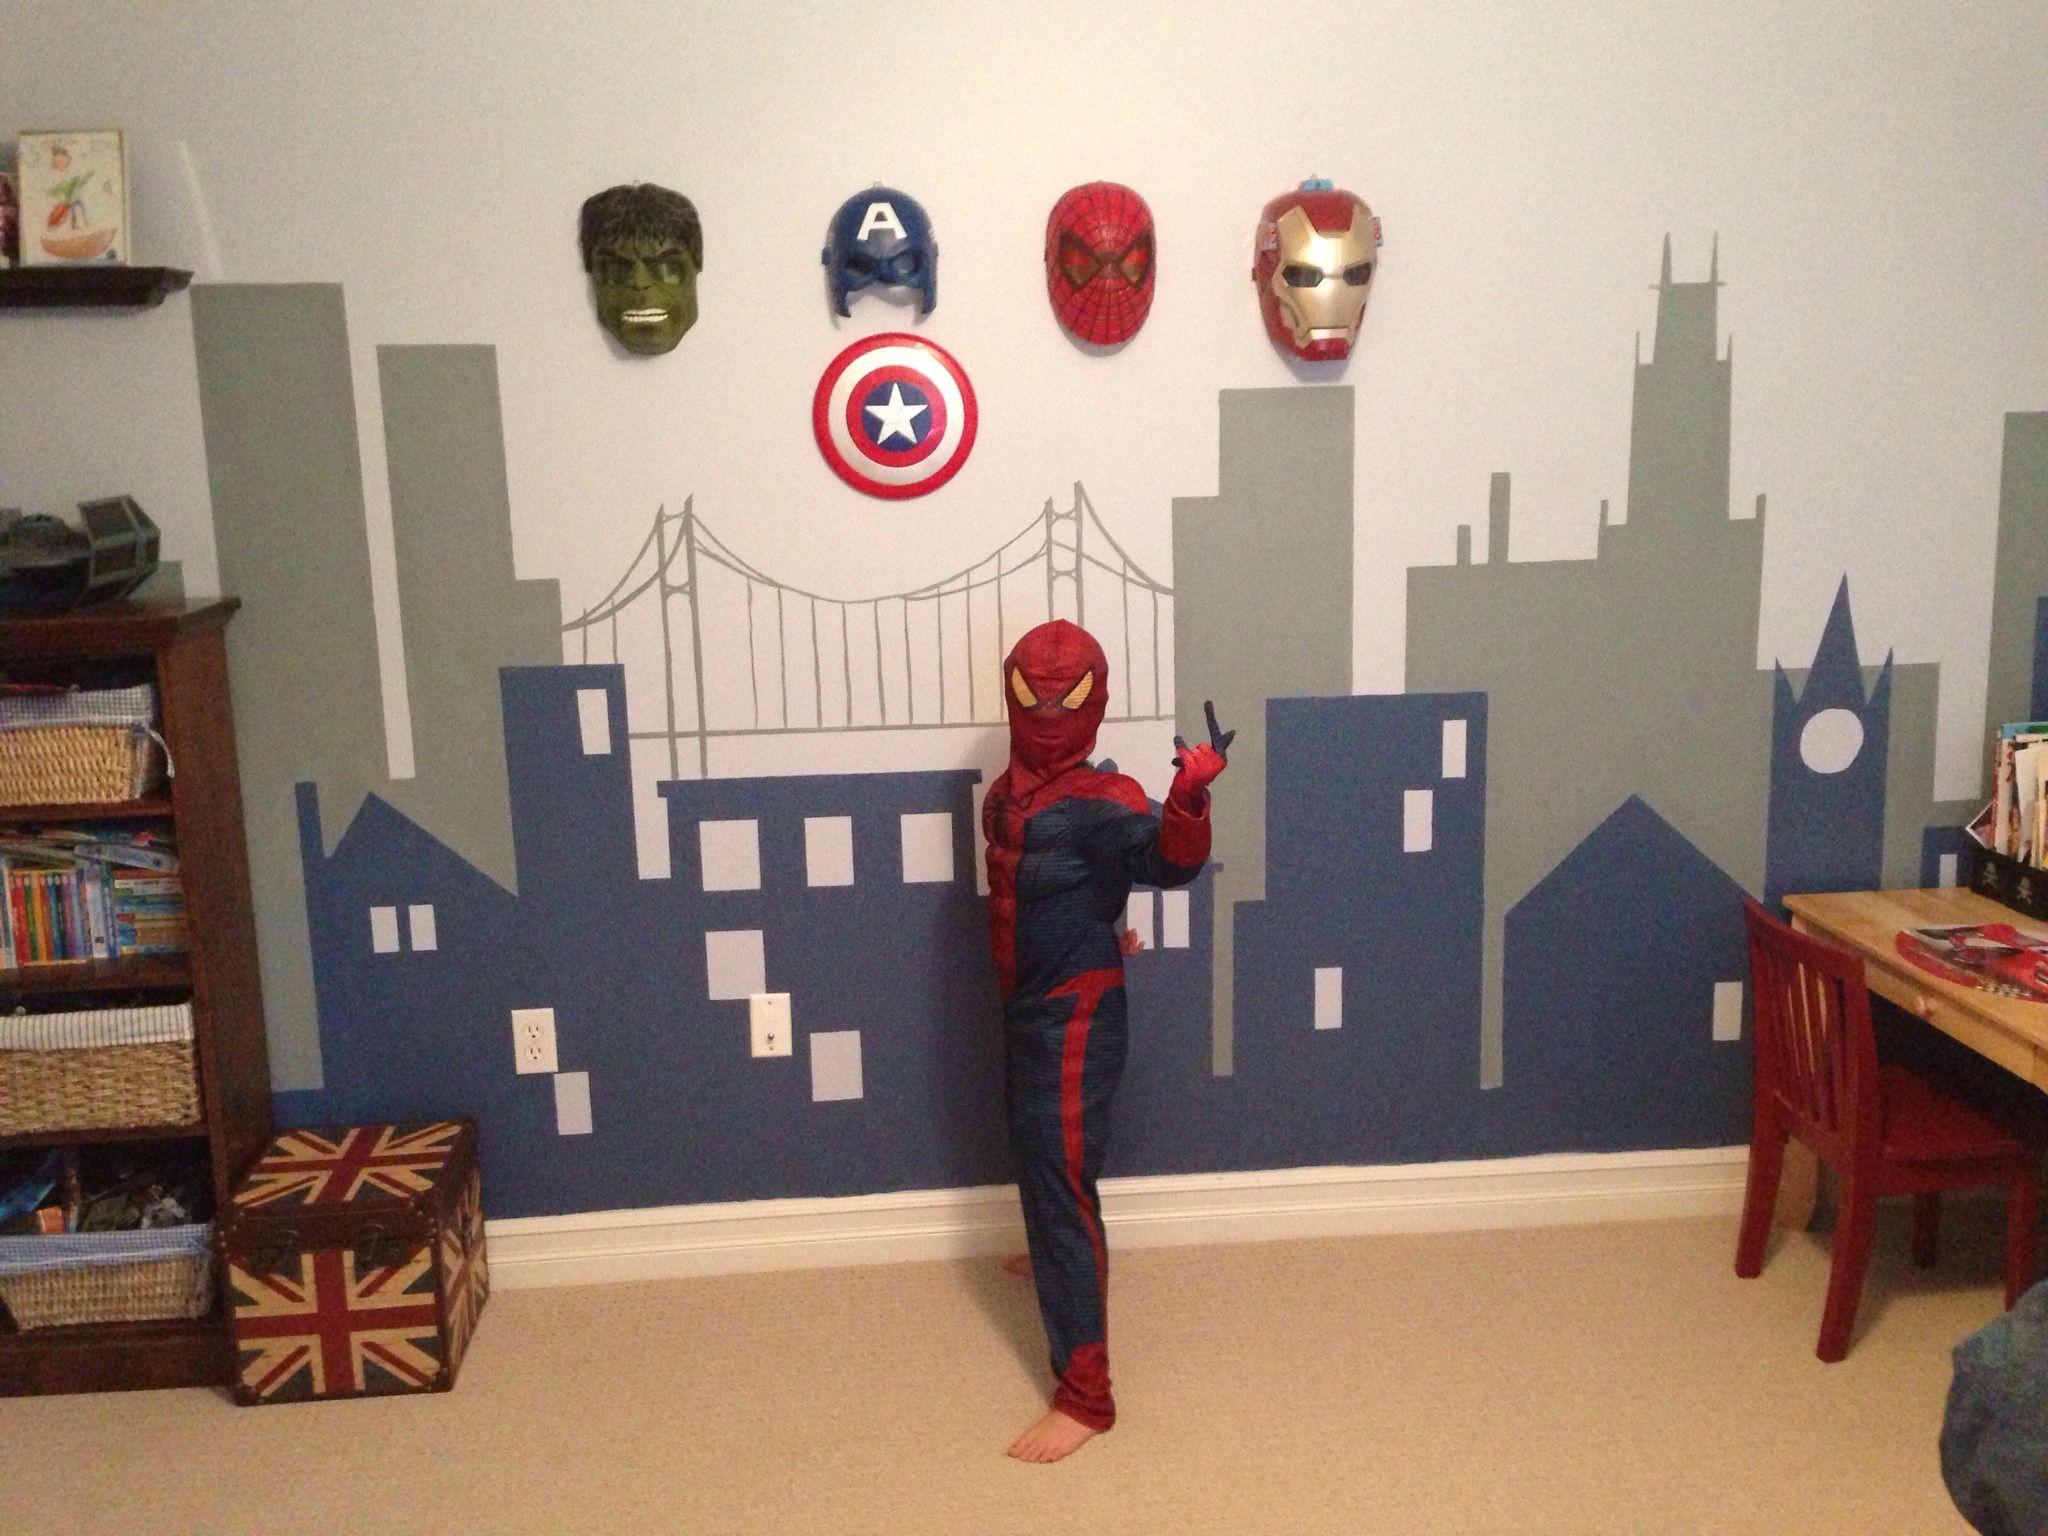 My Superheroes Bedroom As I Lay Me Down To Sleep